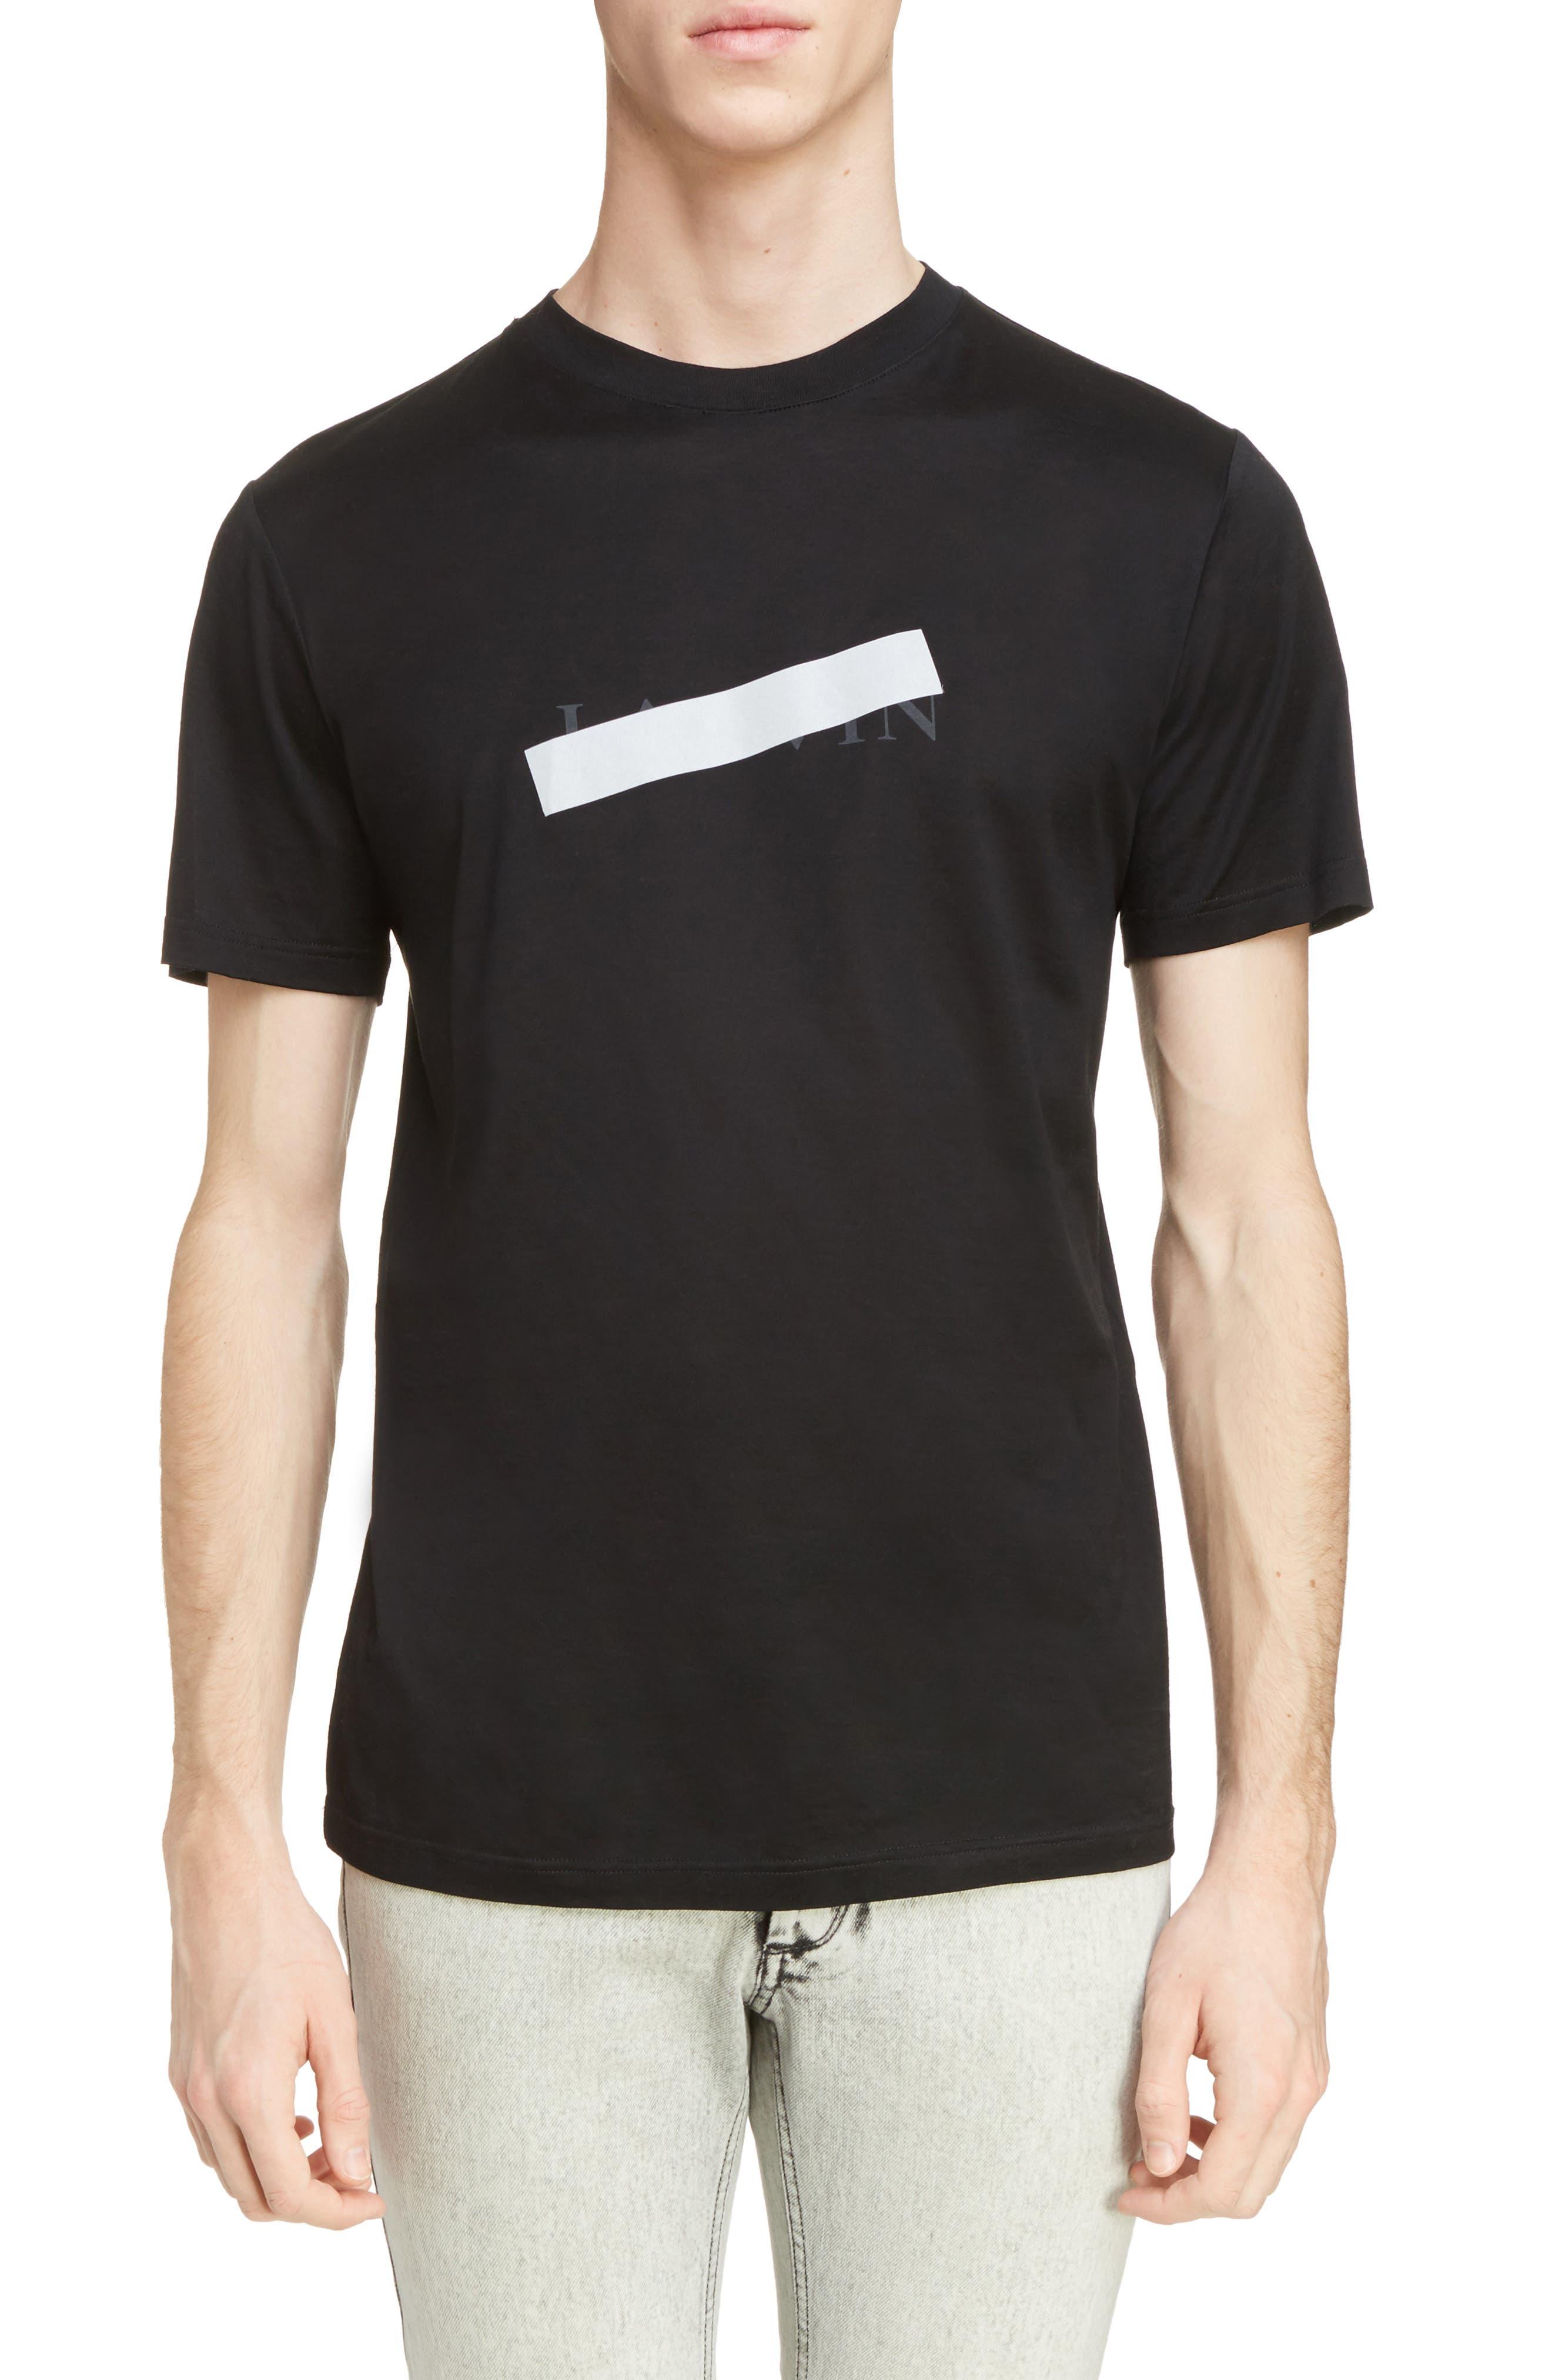 Alternate Image 1 Selected - Lanvin Reflective Tape Logo T-Shirt